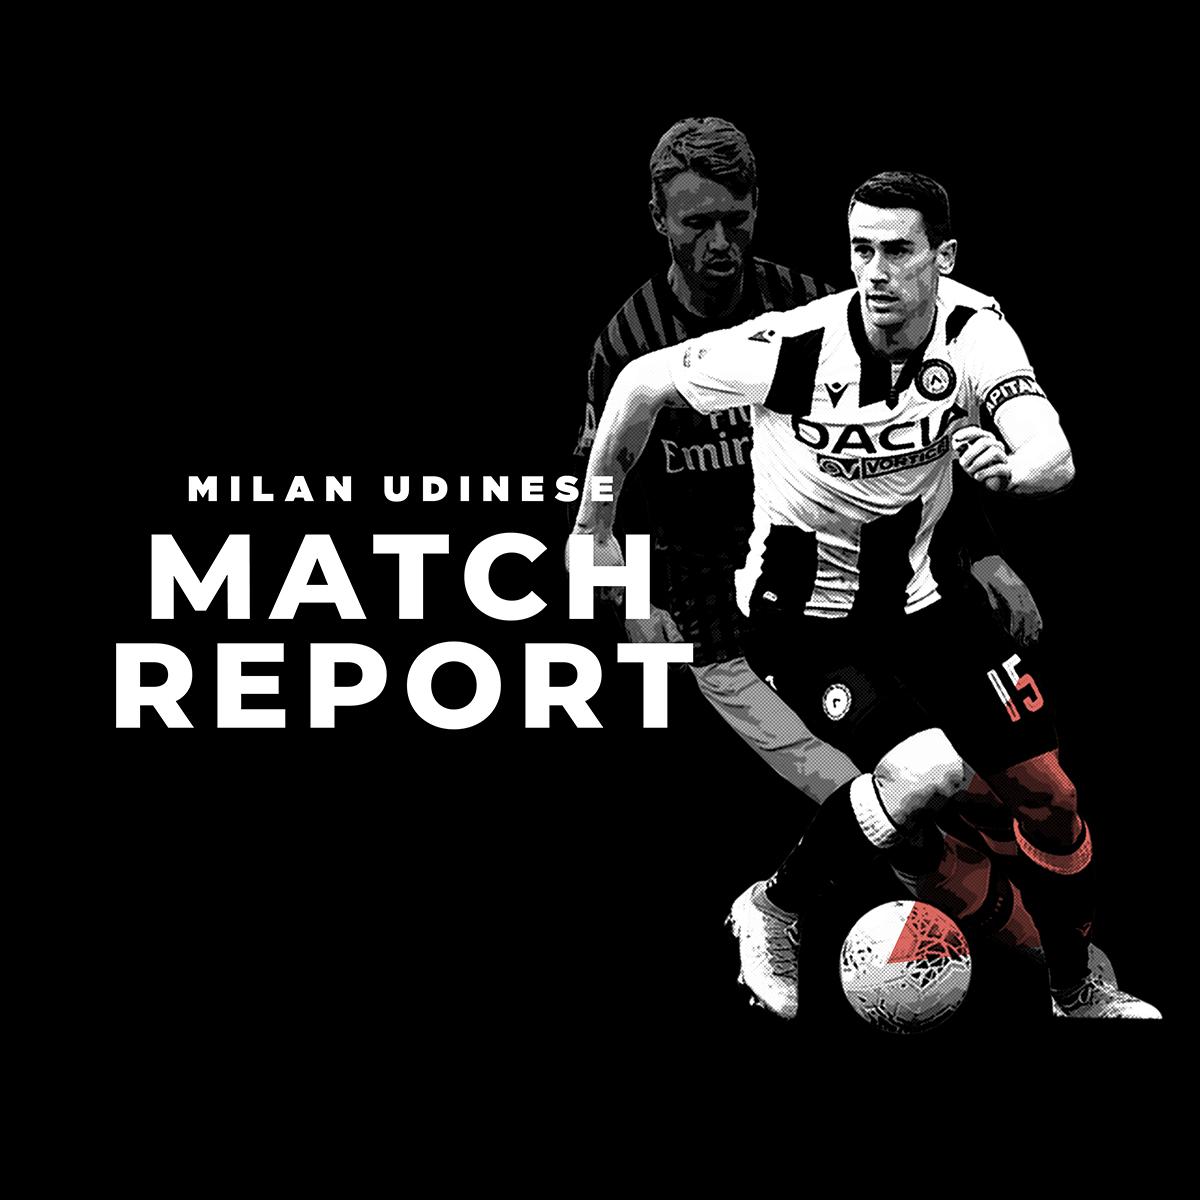 Udinese Calcio @Udinese_1896